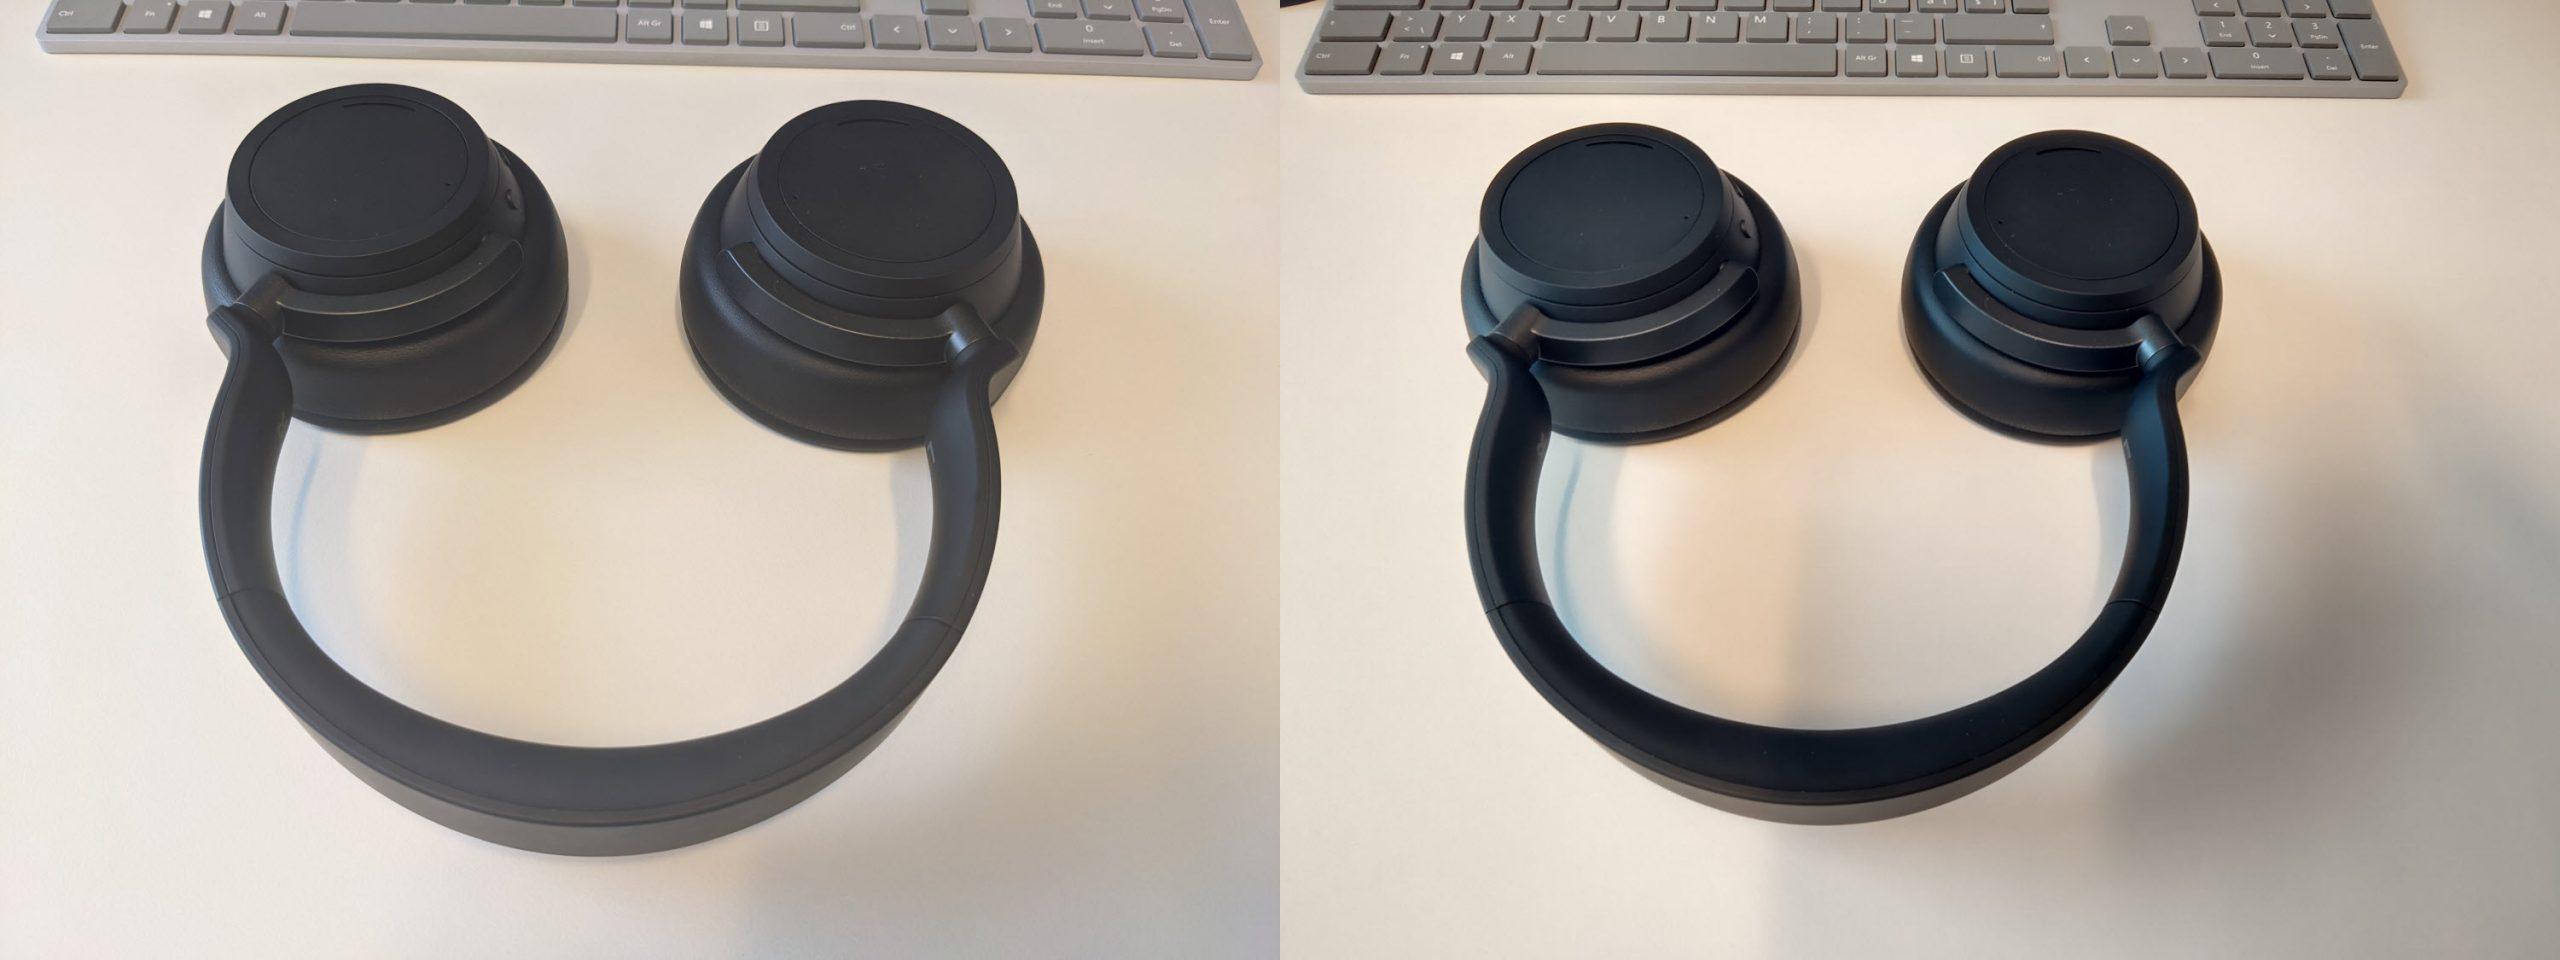 Kameravergleich Google Pixel 4 gegen Surface Duo